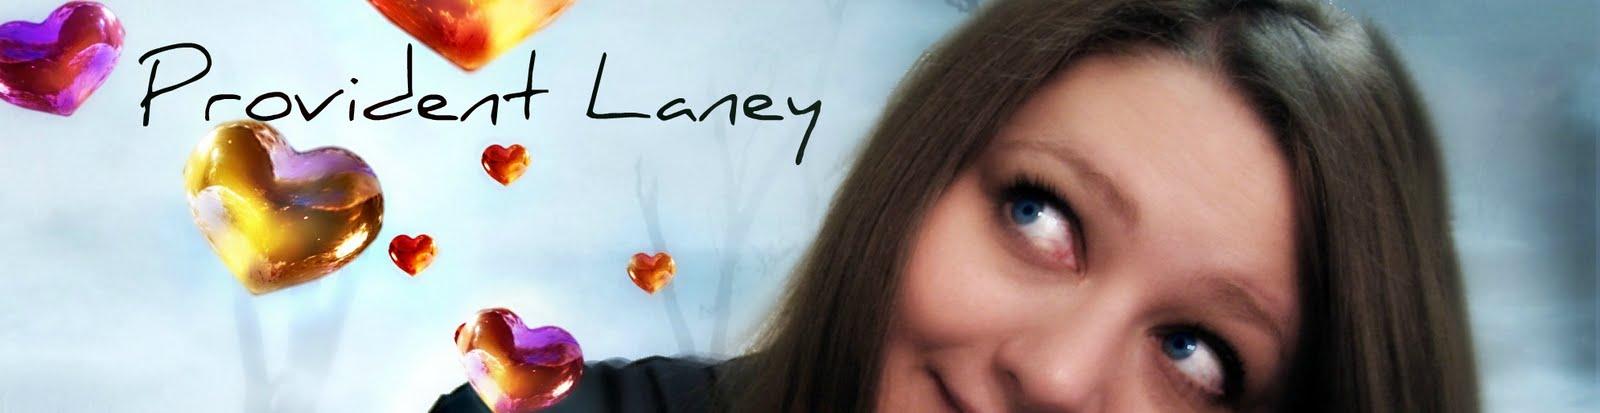 Provident Laney